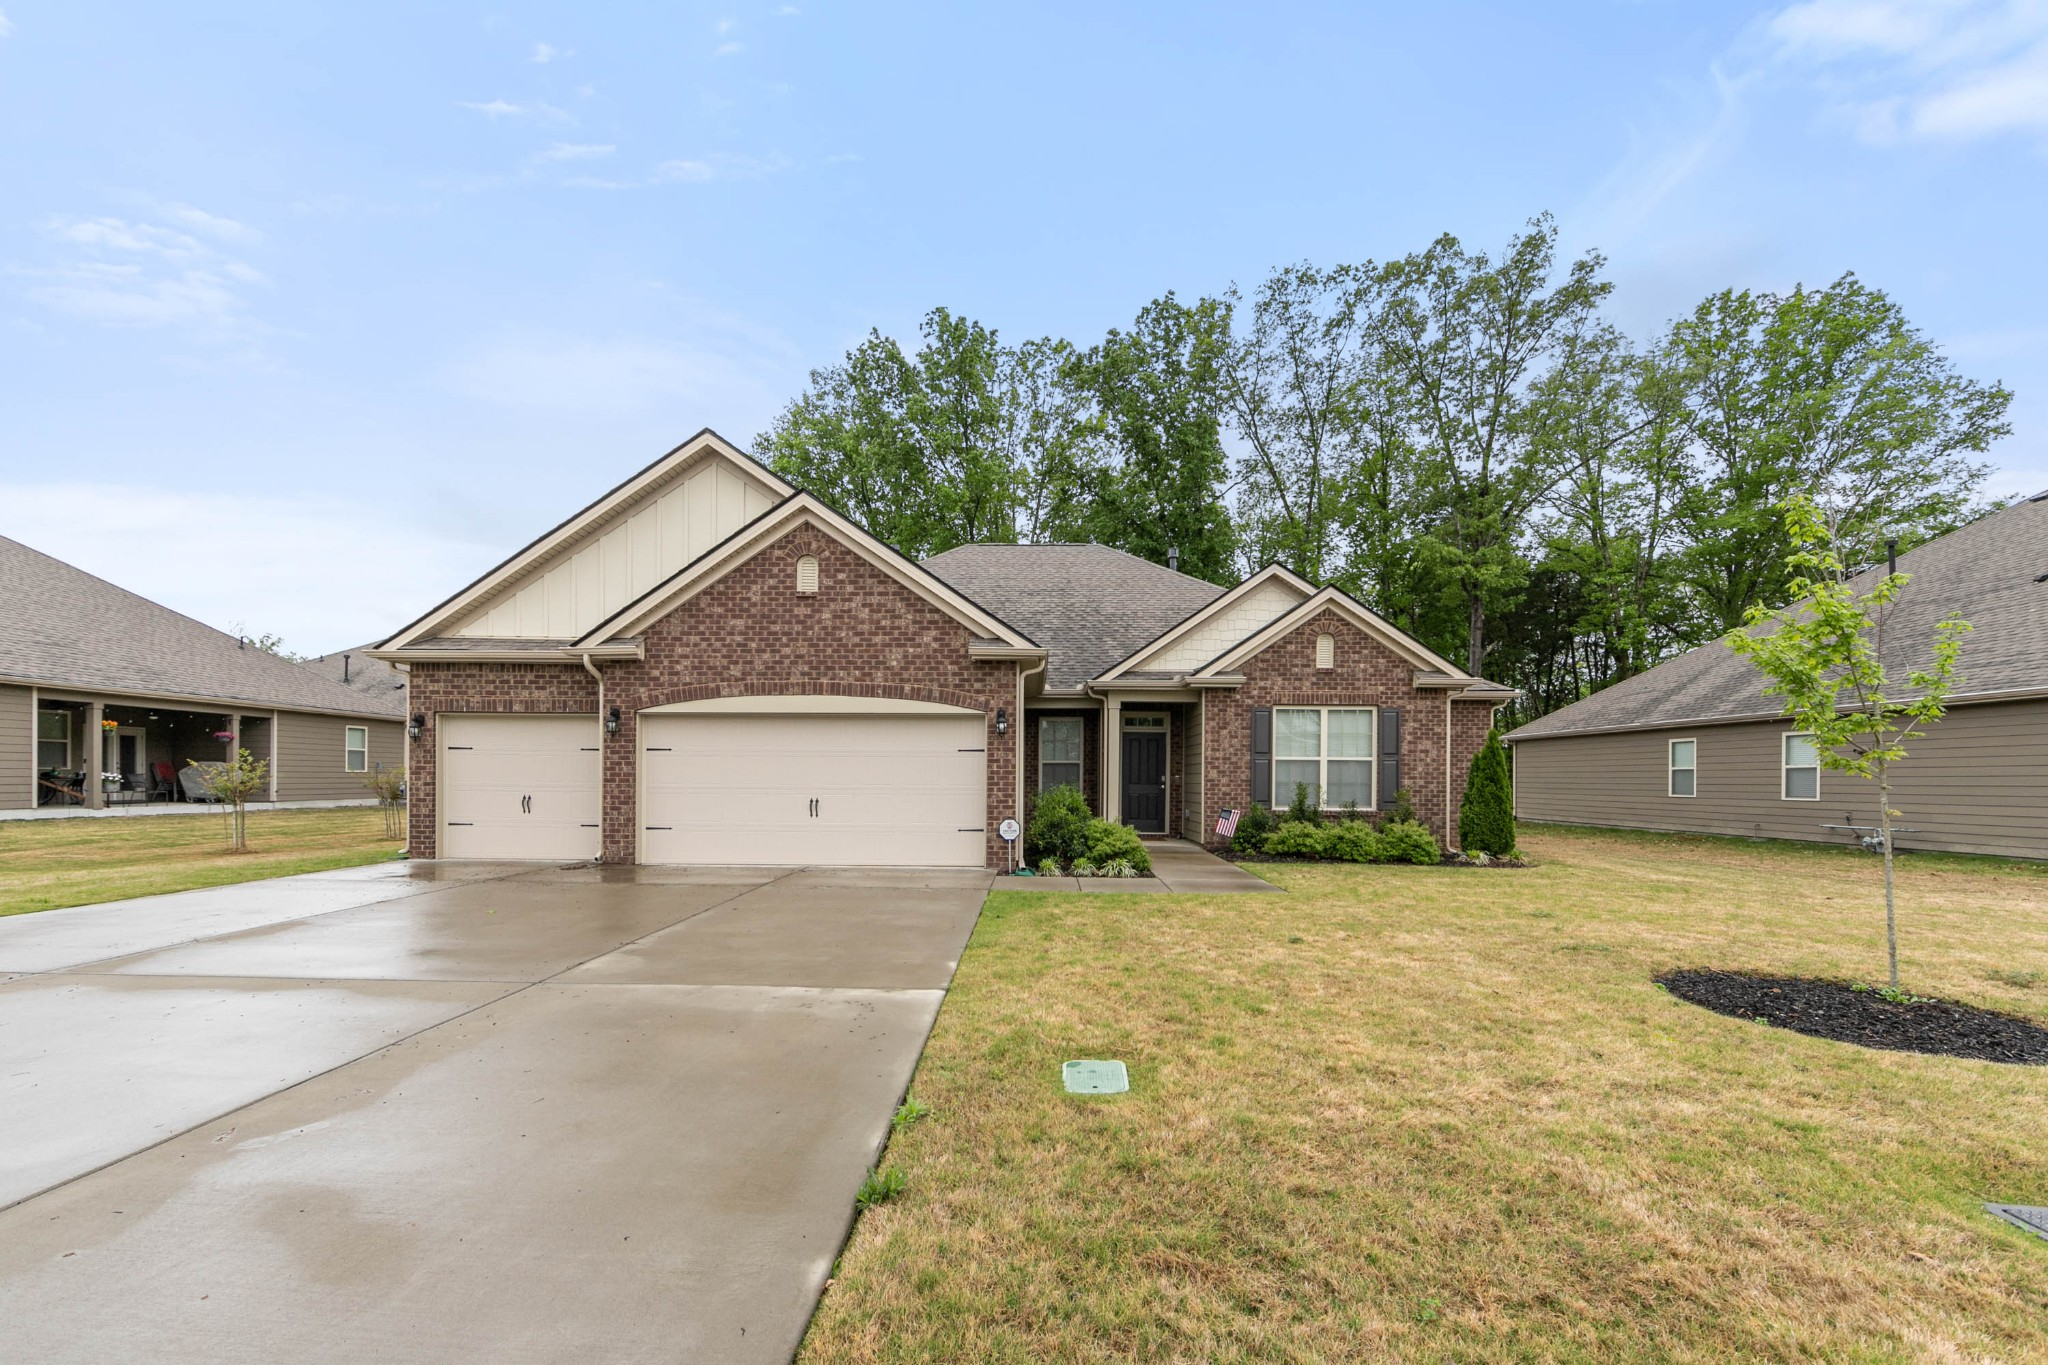 6609 Maple Tree Ct Property Photo - Murfreesboro, TN real estate listing